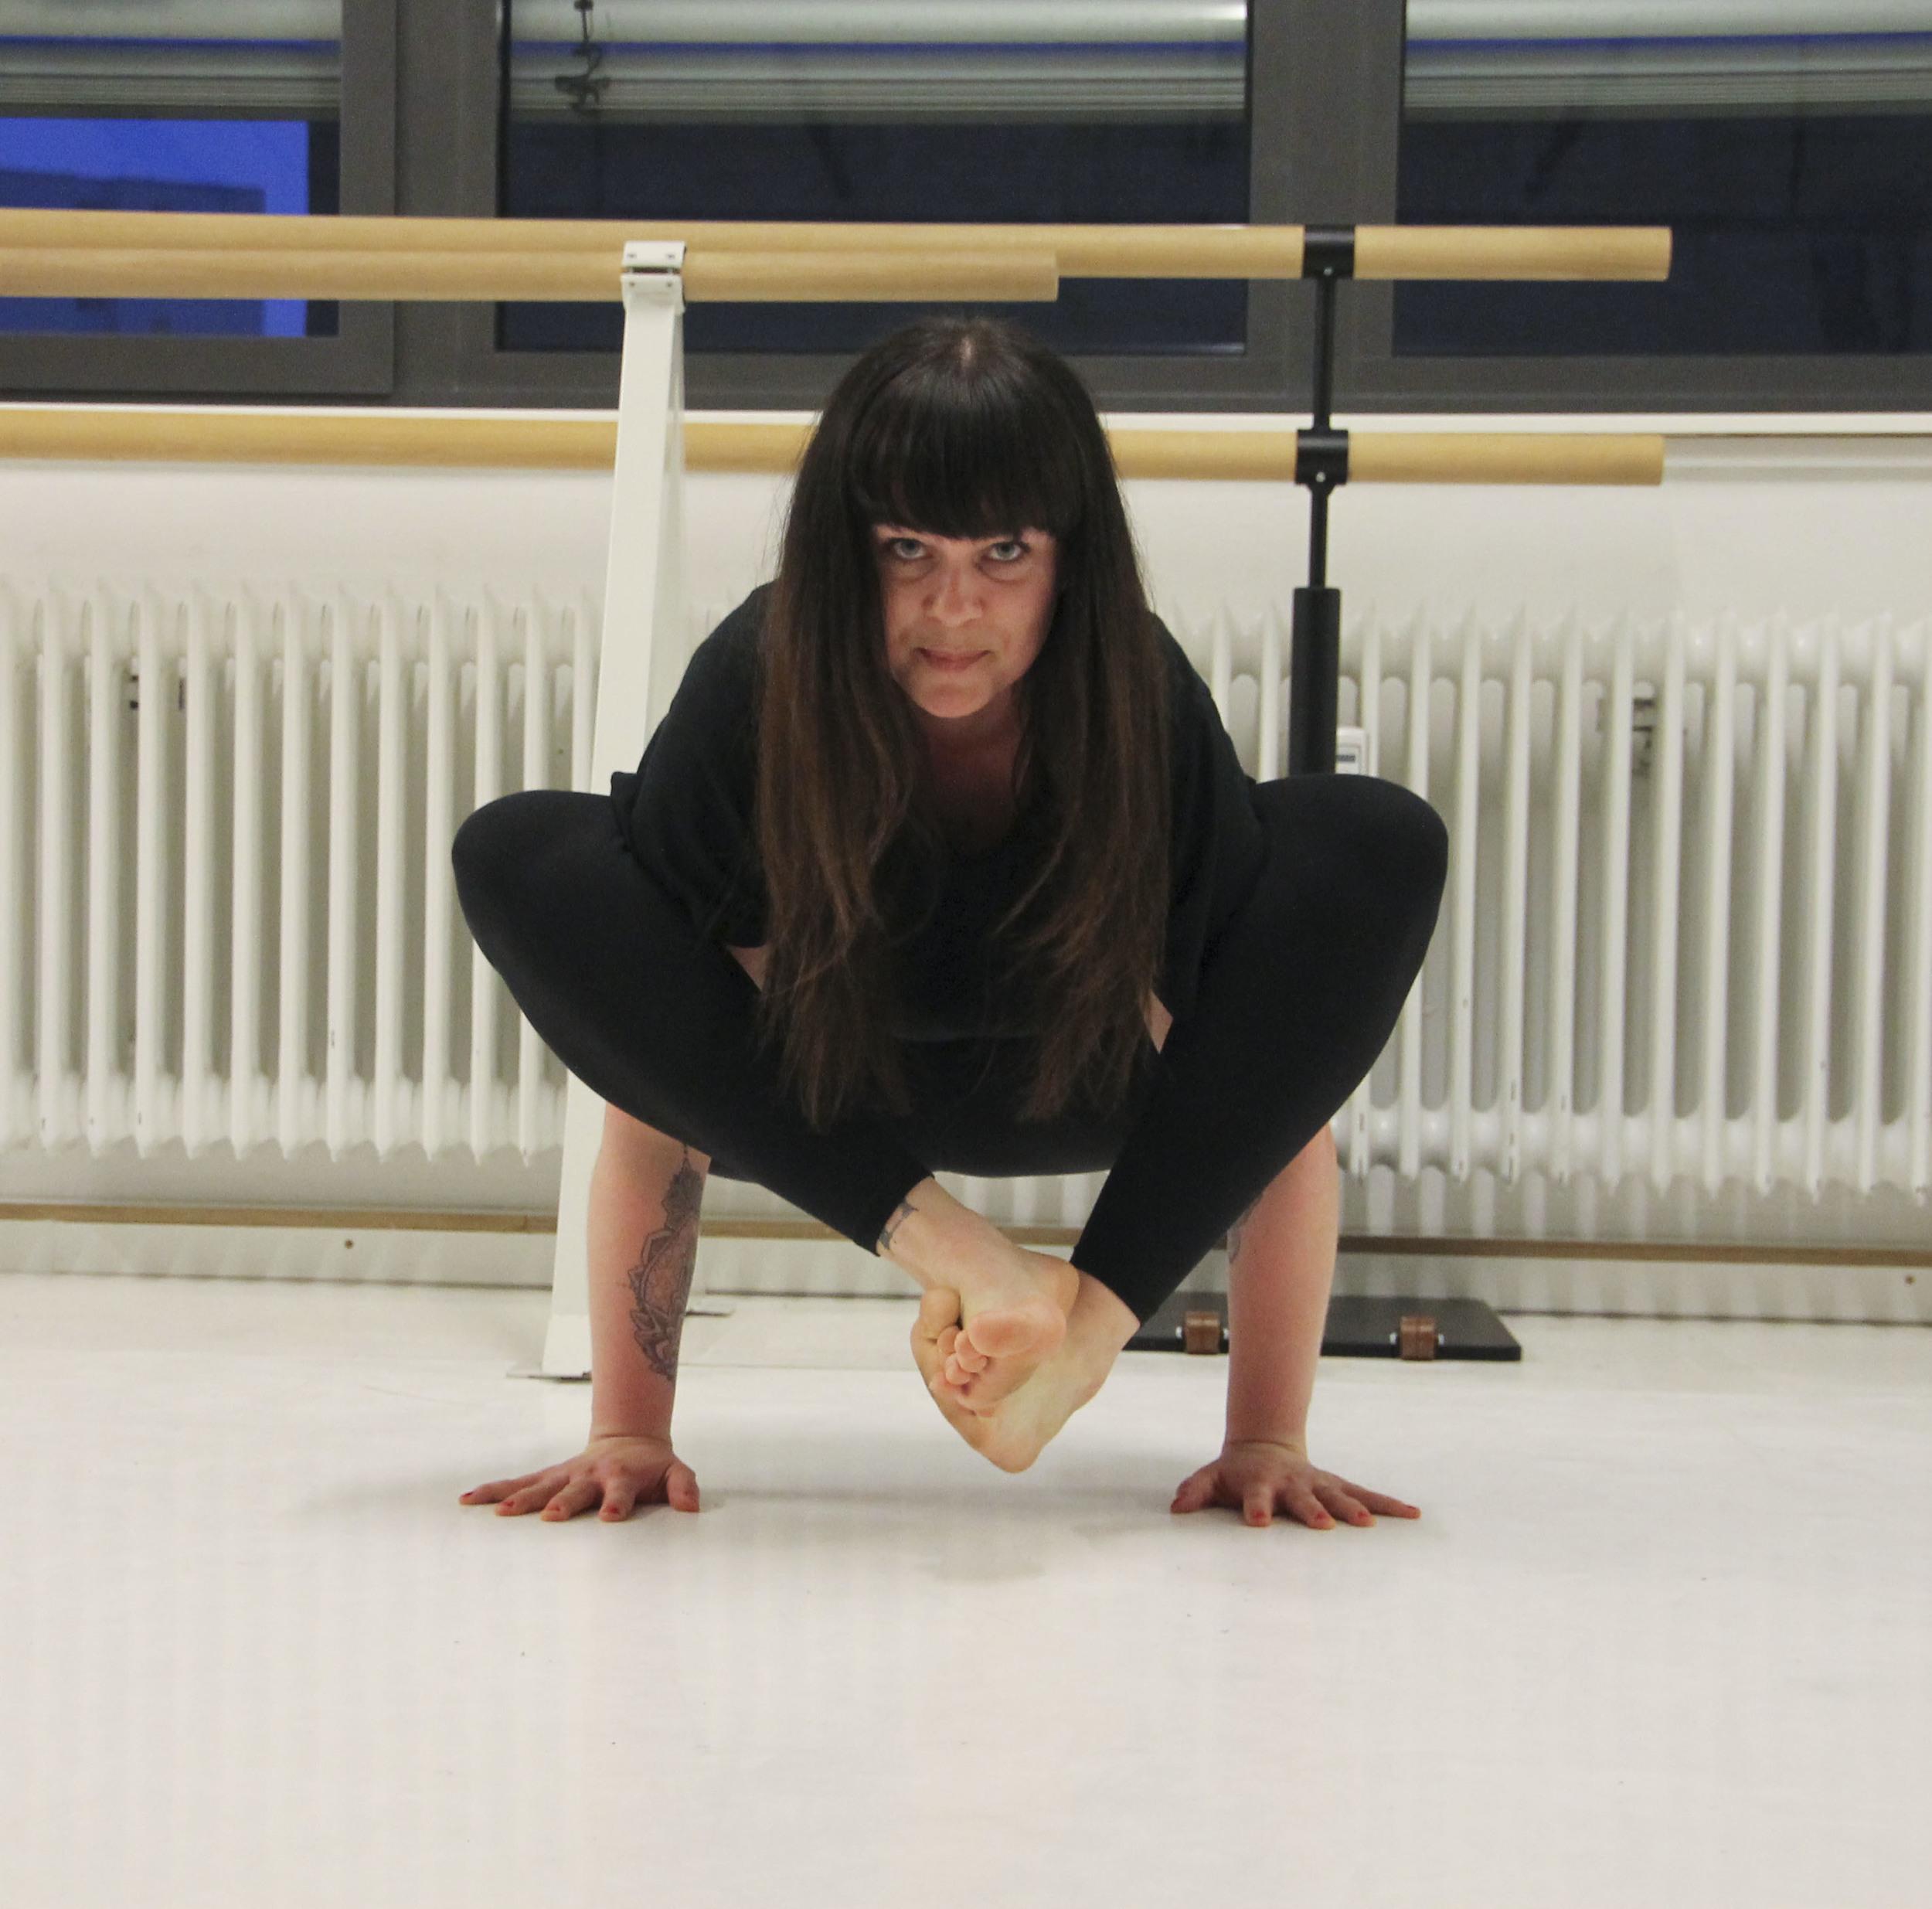 hip hop yoga berlin kreuzberg motions1362.jpg